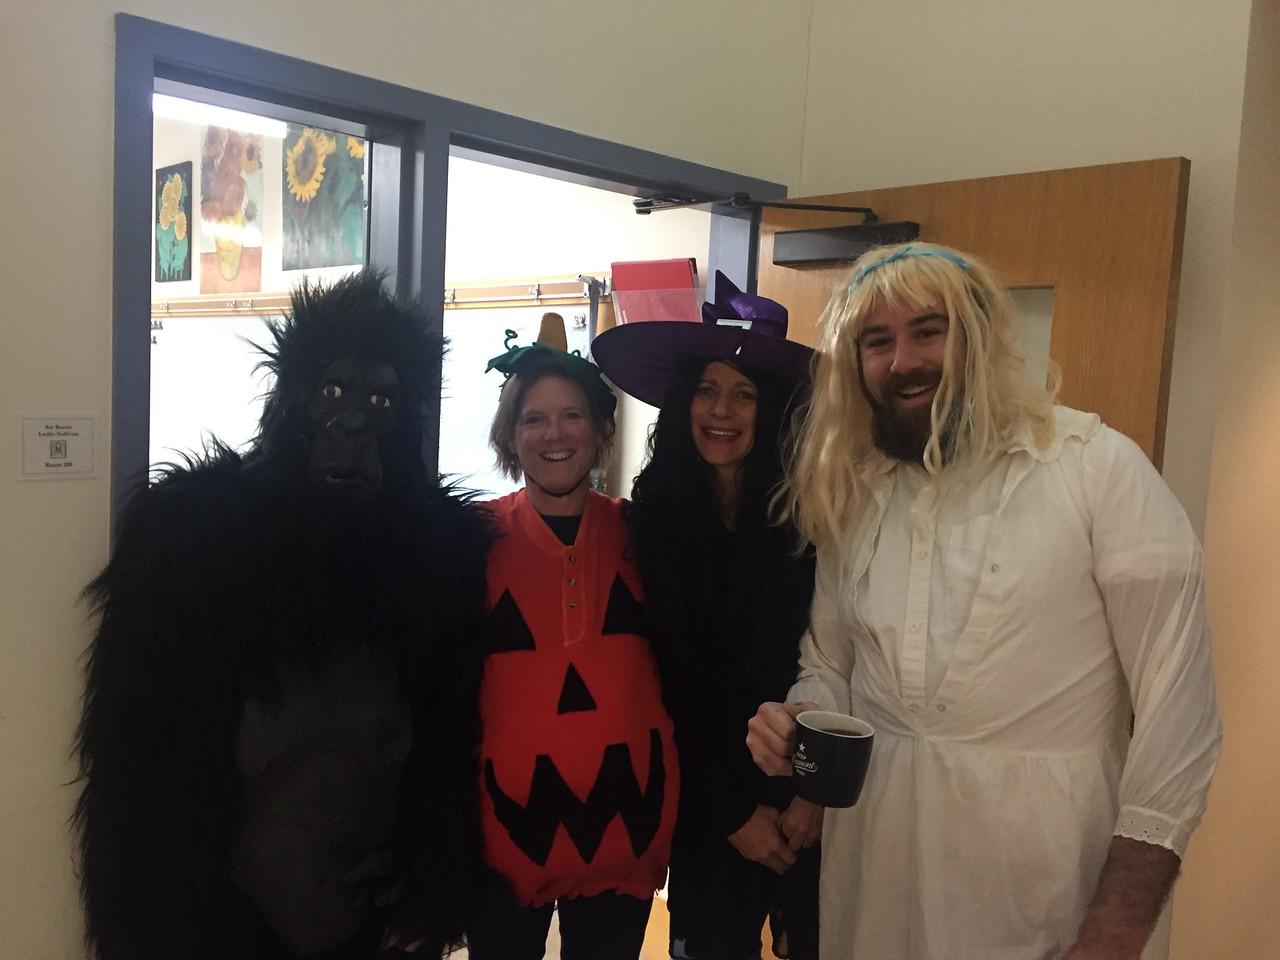 A gorilla, a pumpkin, a witch and Goldilocks walk into the school...